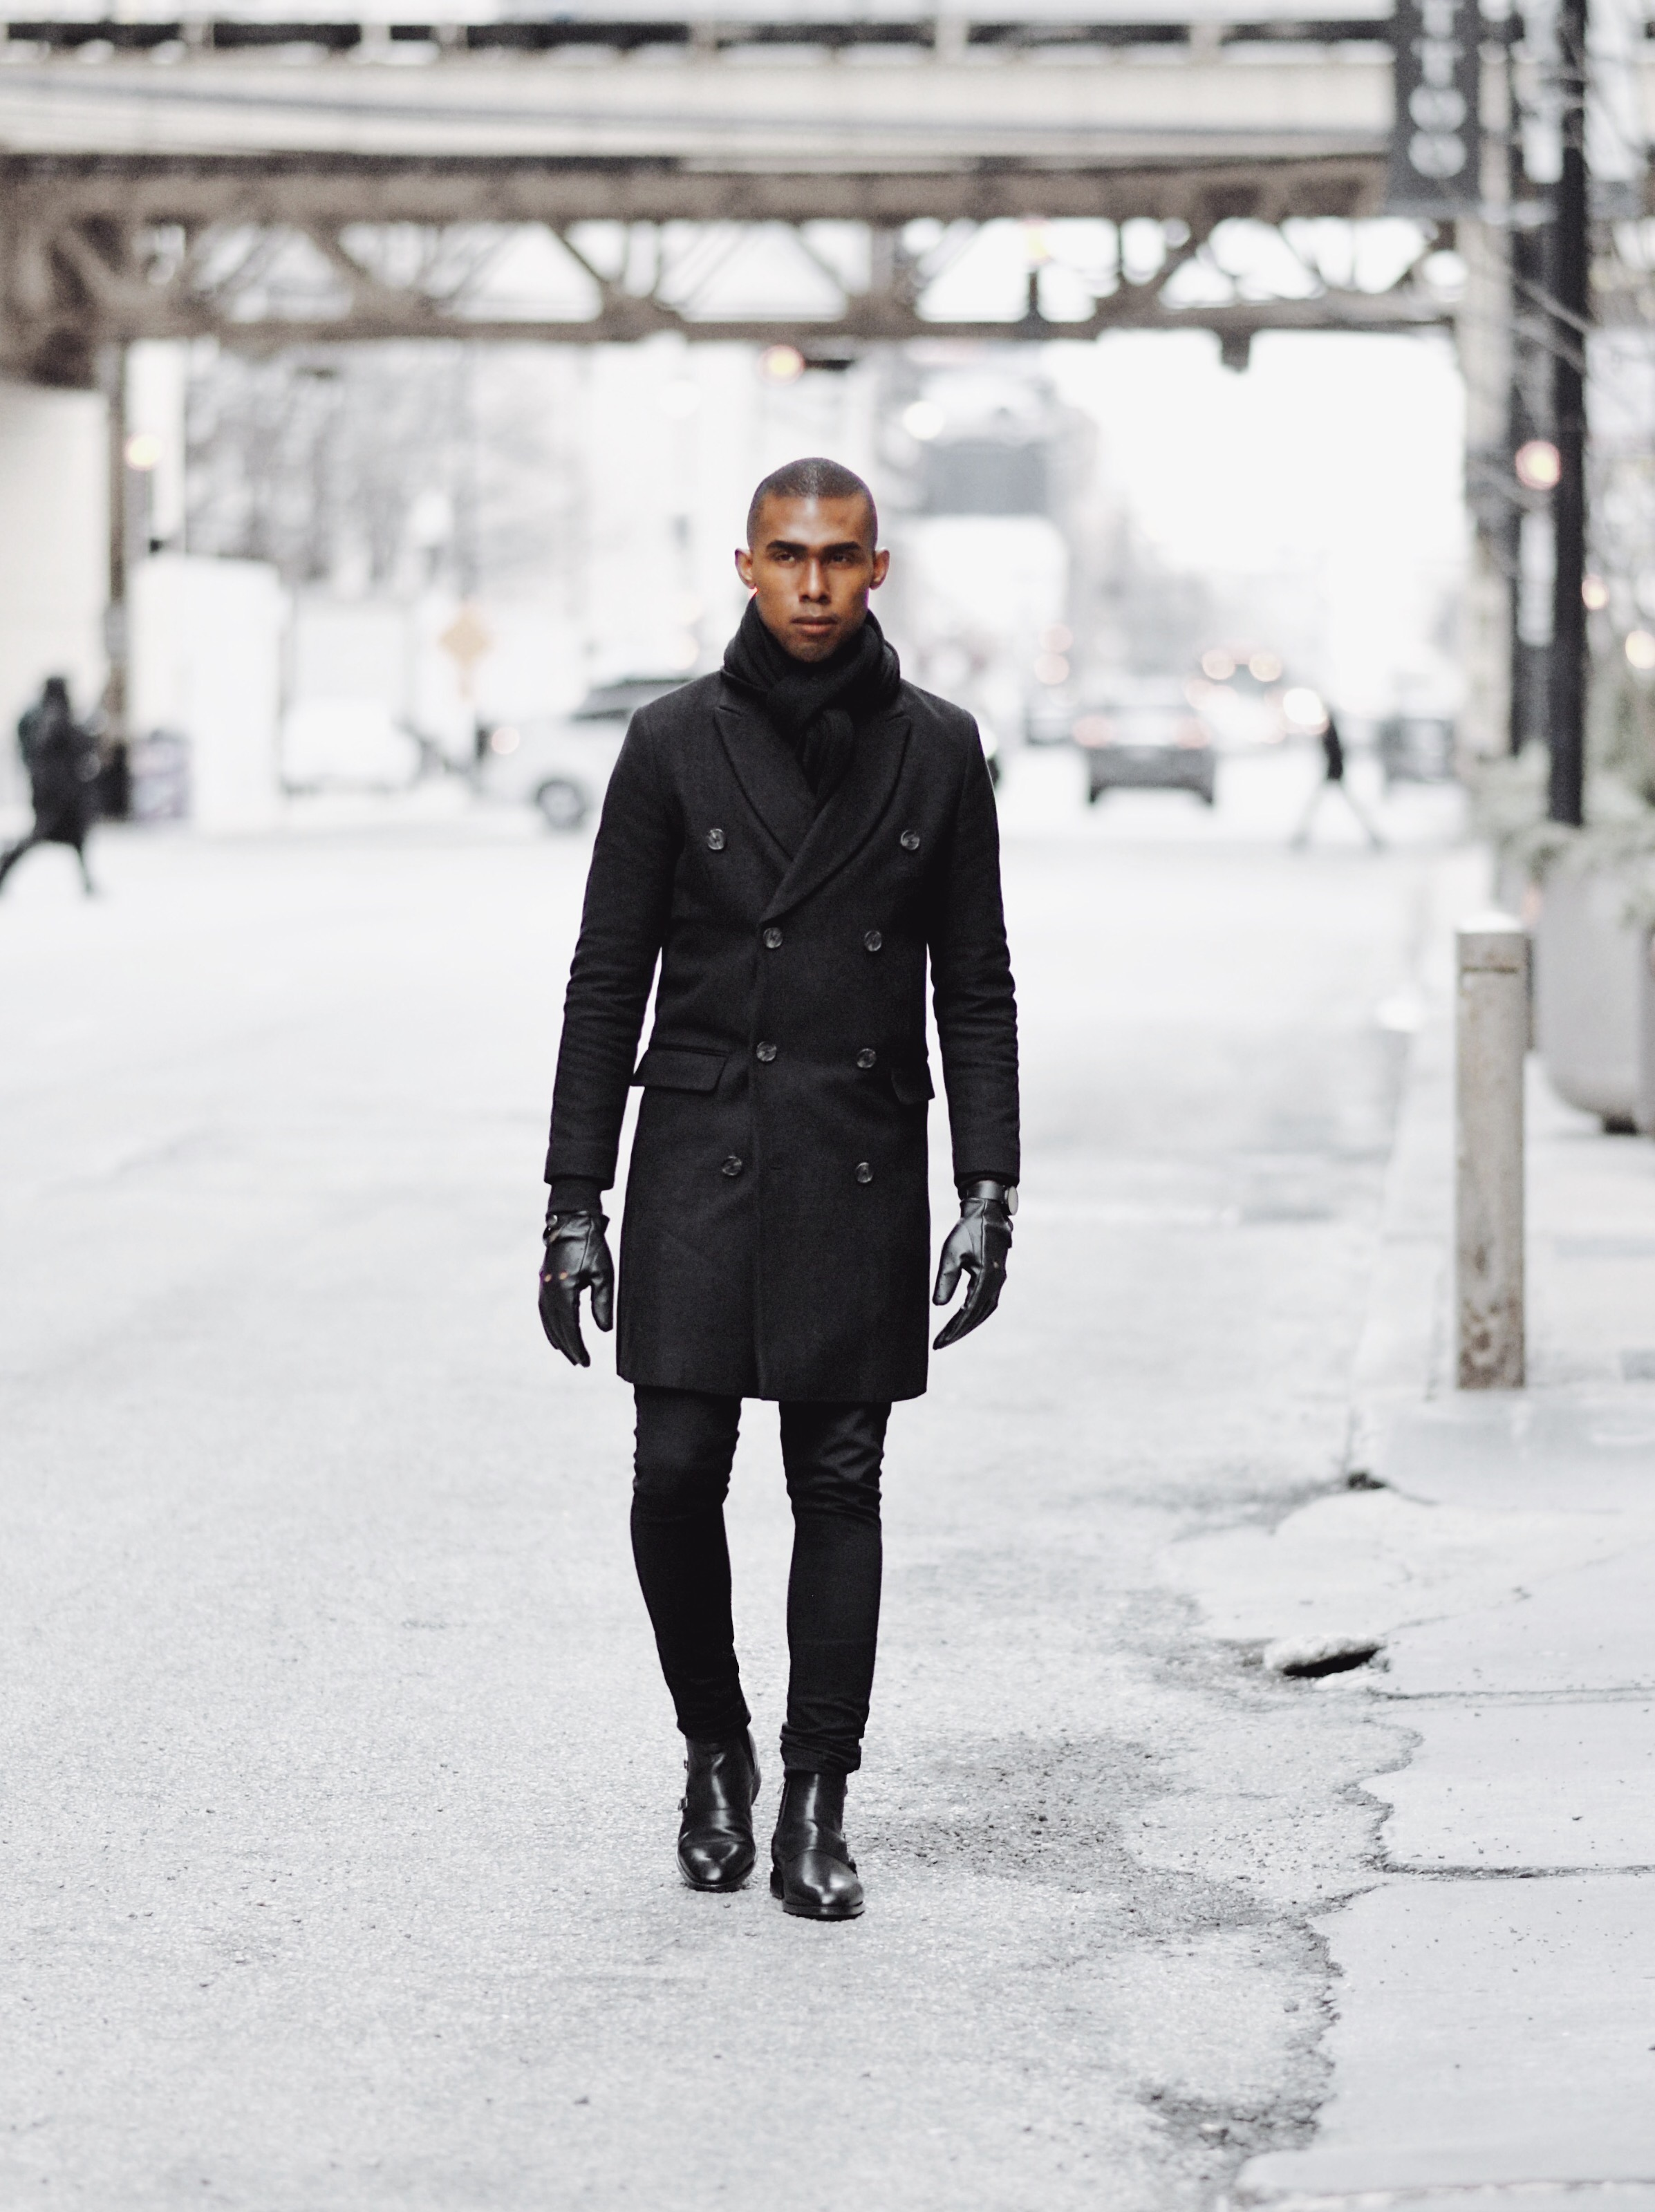 The-Look-Principle-Black-Overcoat-In-The-Winter.jpg